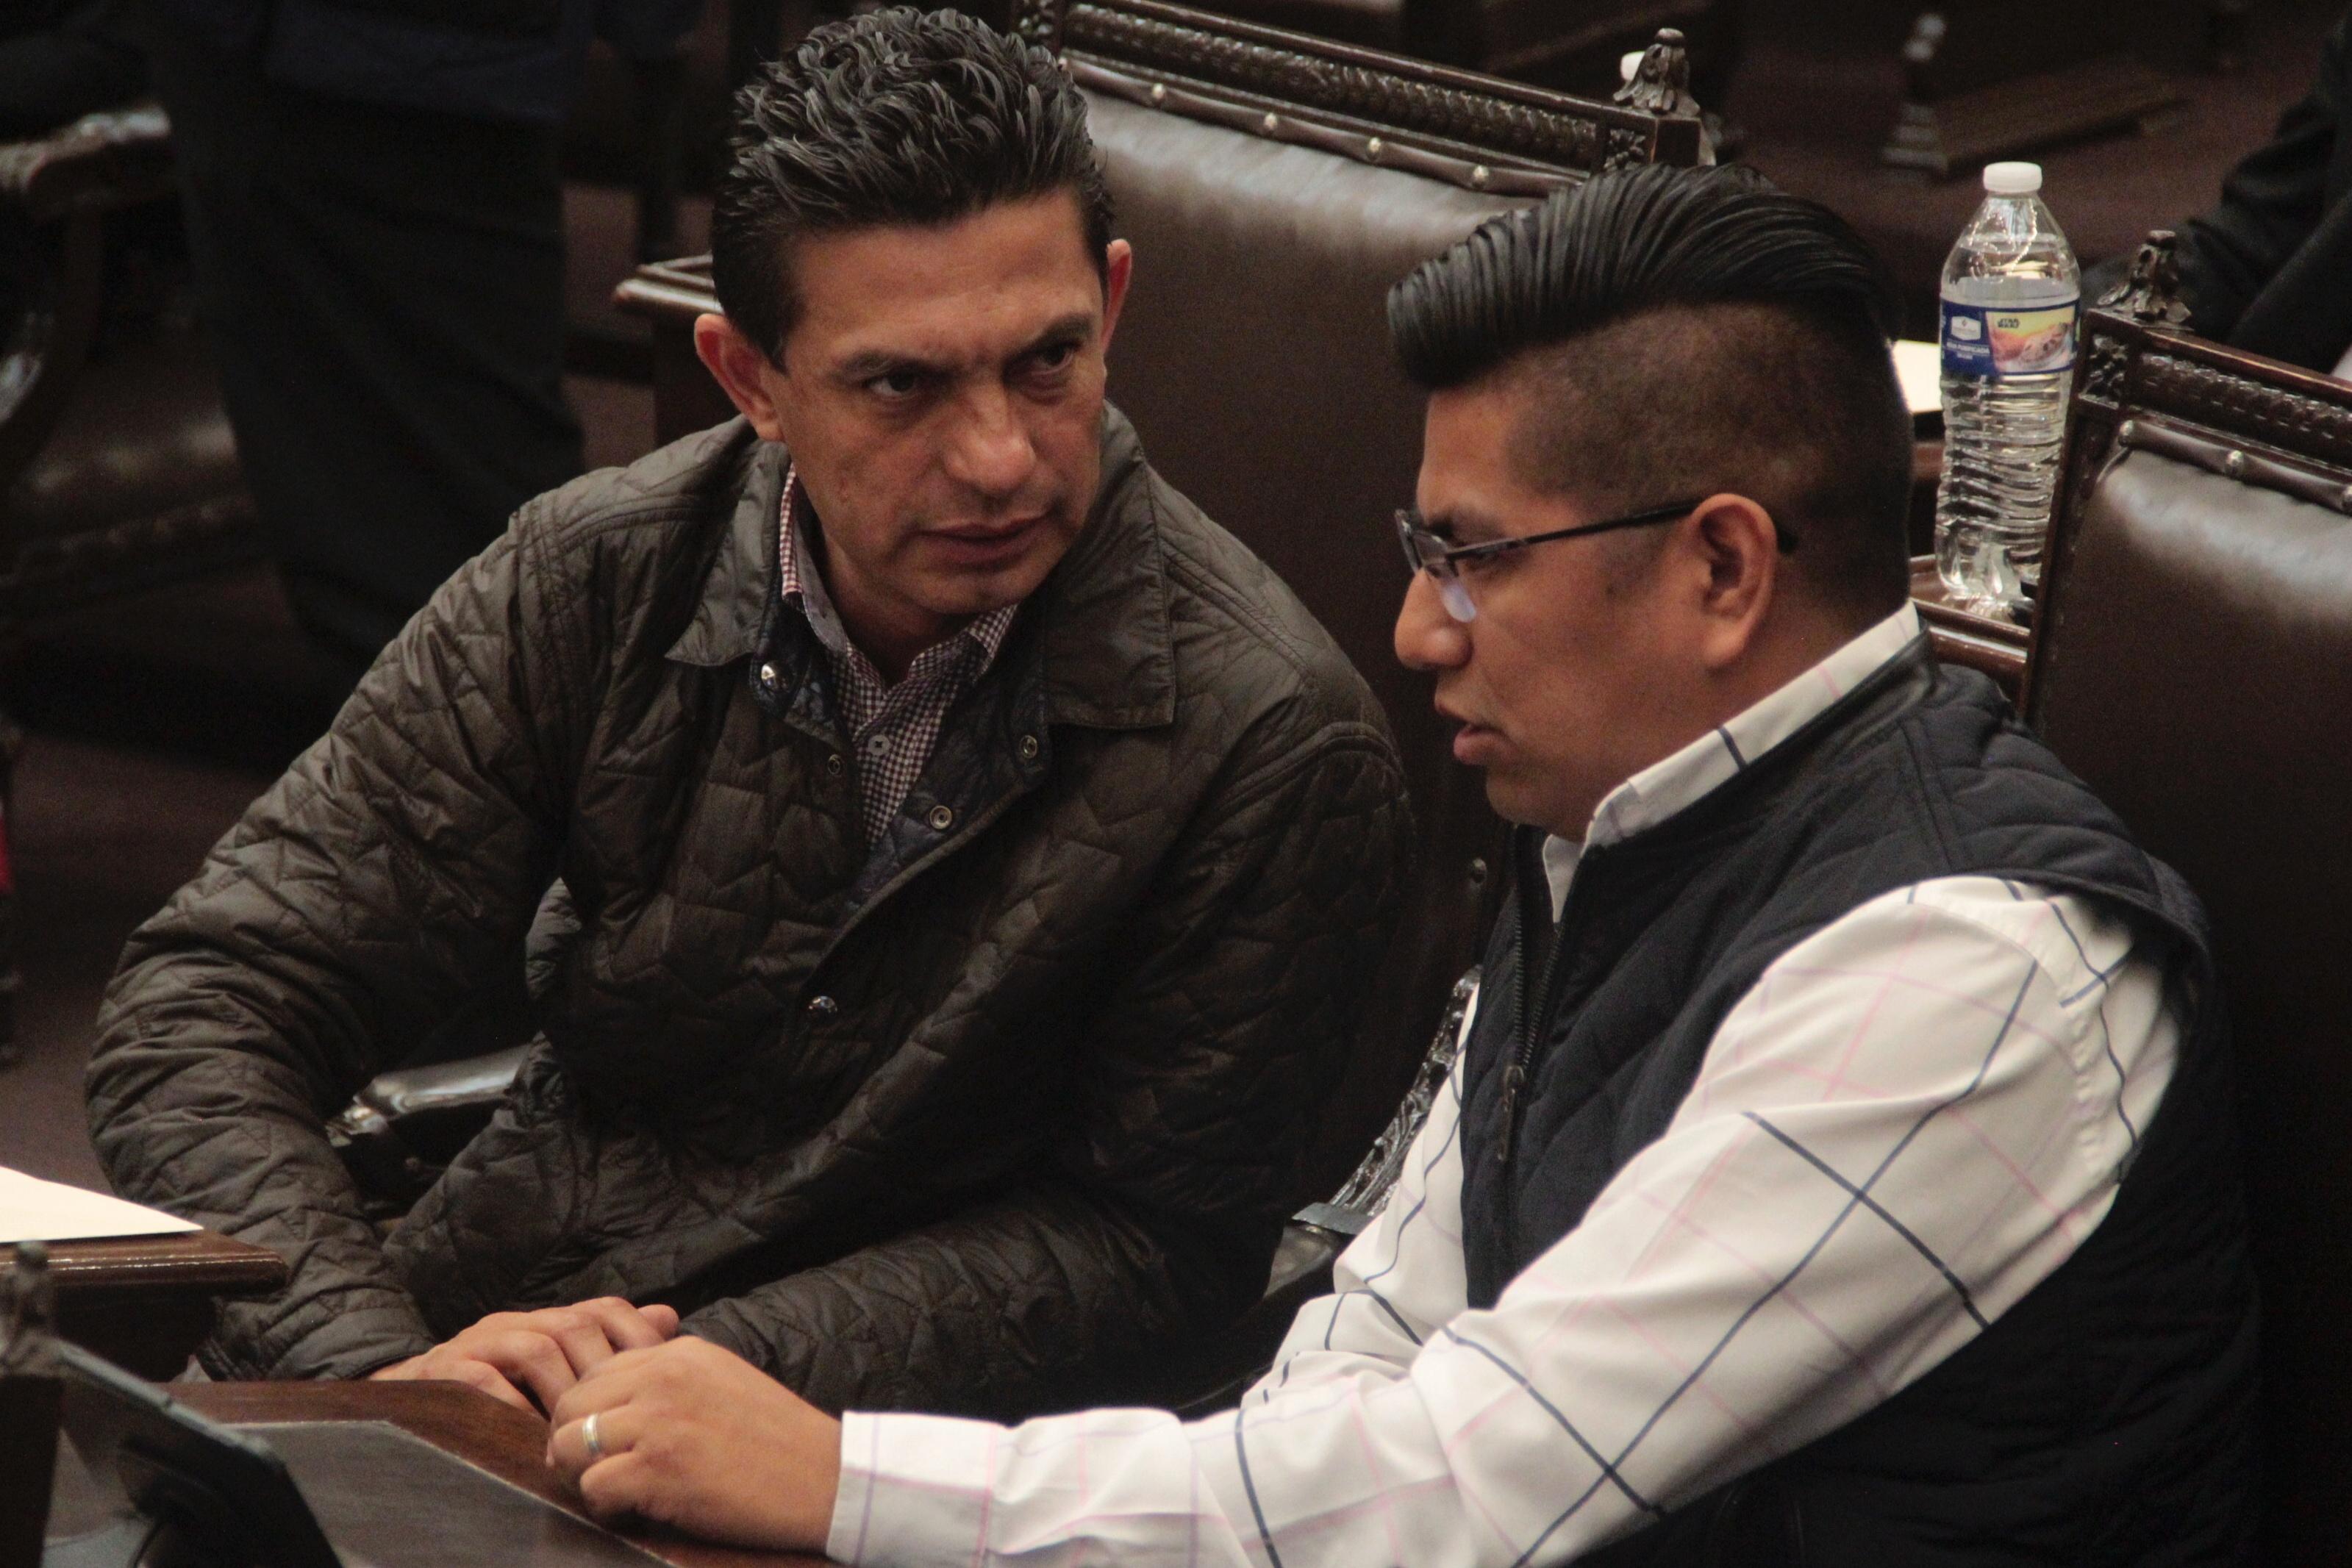 Congreso nombrará concejo municipal en Tiaguismanalco